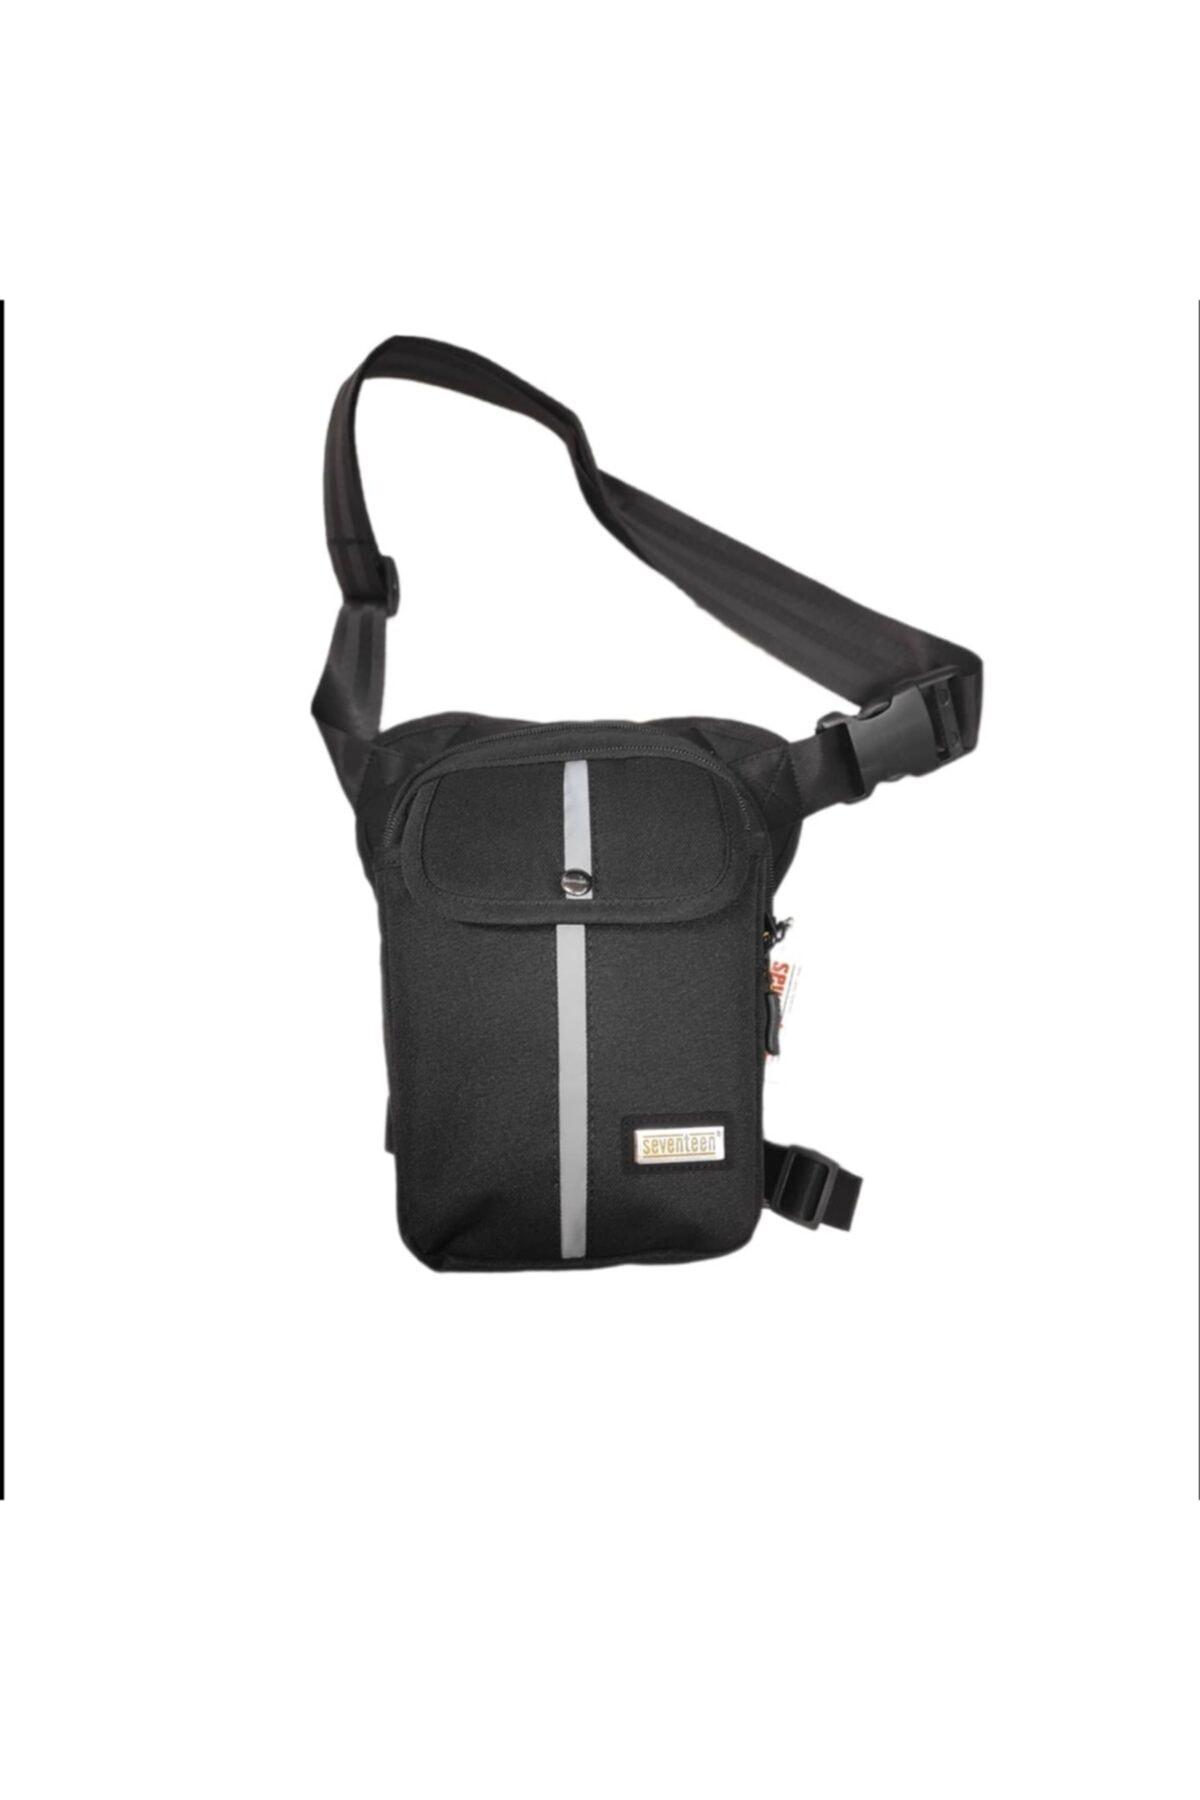 کیف کمری مردانه مدل دار برند Gölge kemer cüzdan ve çanta رنگ مشکی کد ty101103161